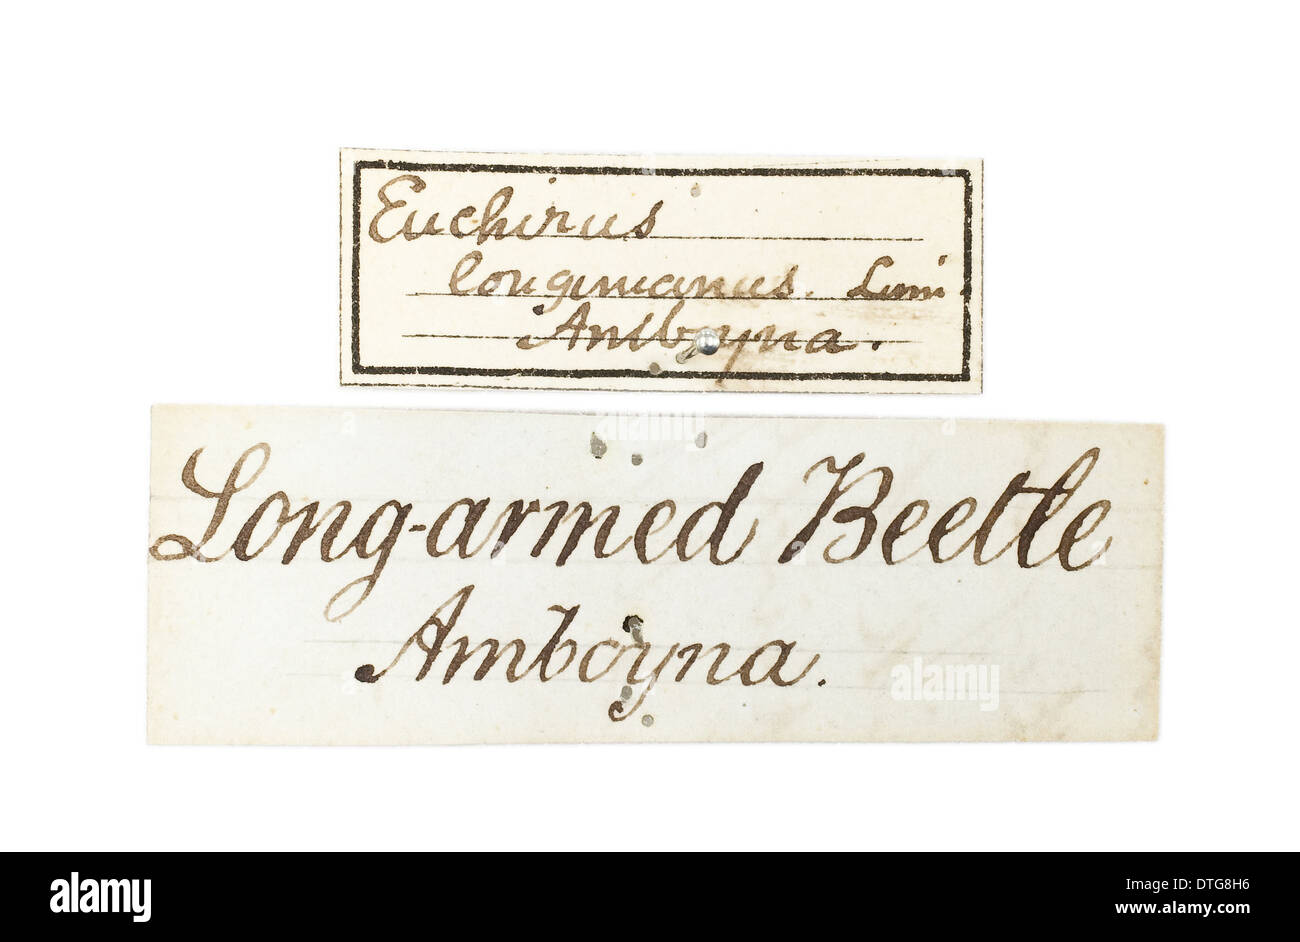 Label for Euchirus longimanus, Wallace's Long armed beetle - Stock Image